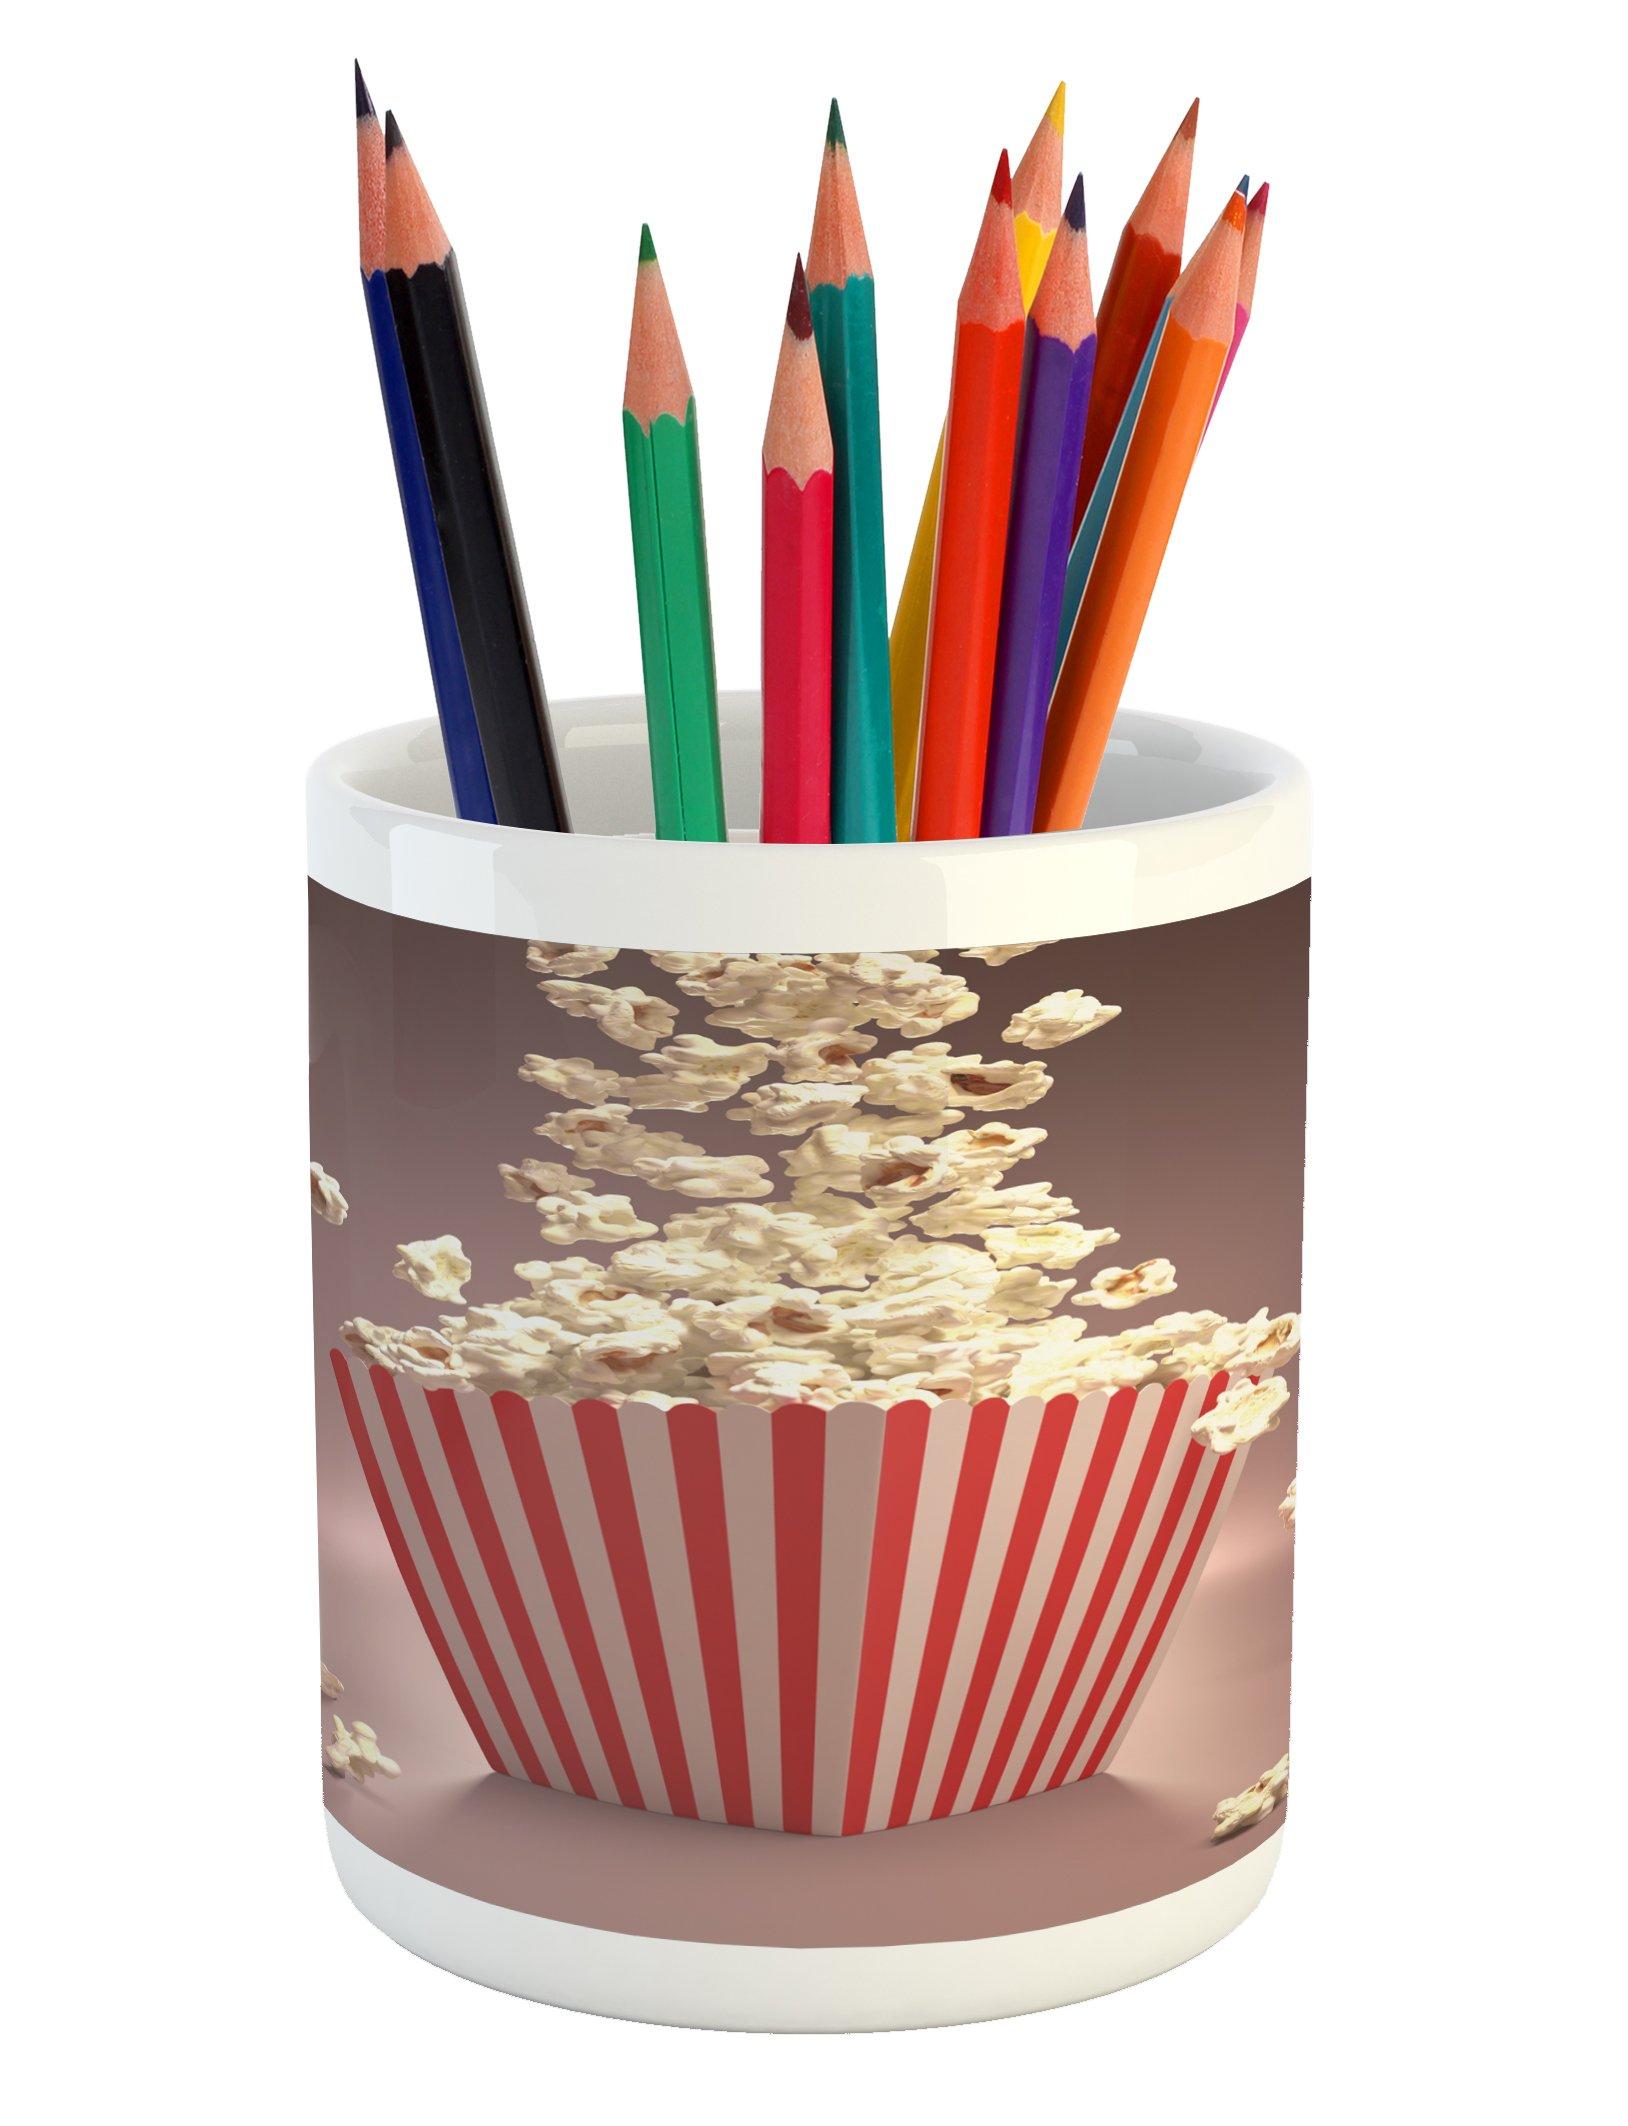 Lunarable Retro Pencil Pen Holder, Retro Style Popcorn Art Image Cinema Movie Theater Theme in Classical Display, Printed Ceramic Pencil Pen Holder for Desk Office Accessory, Pale Red White